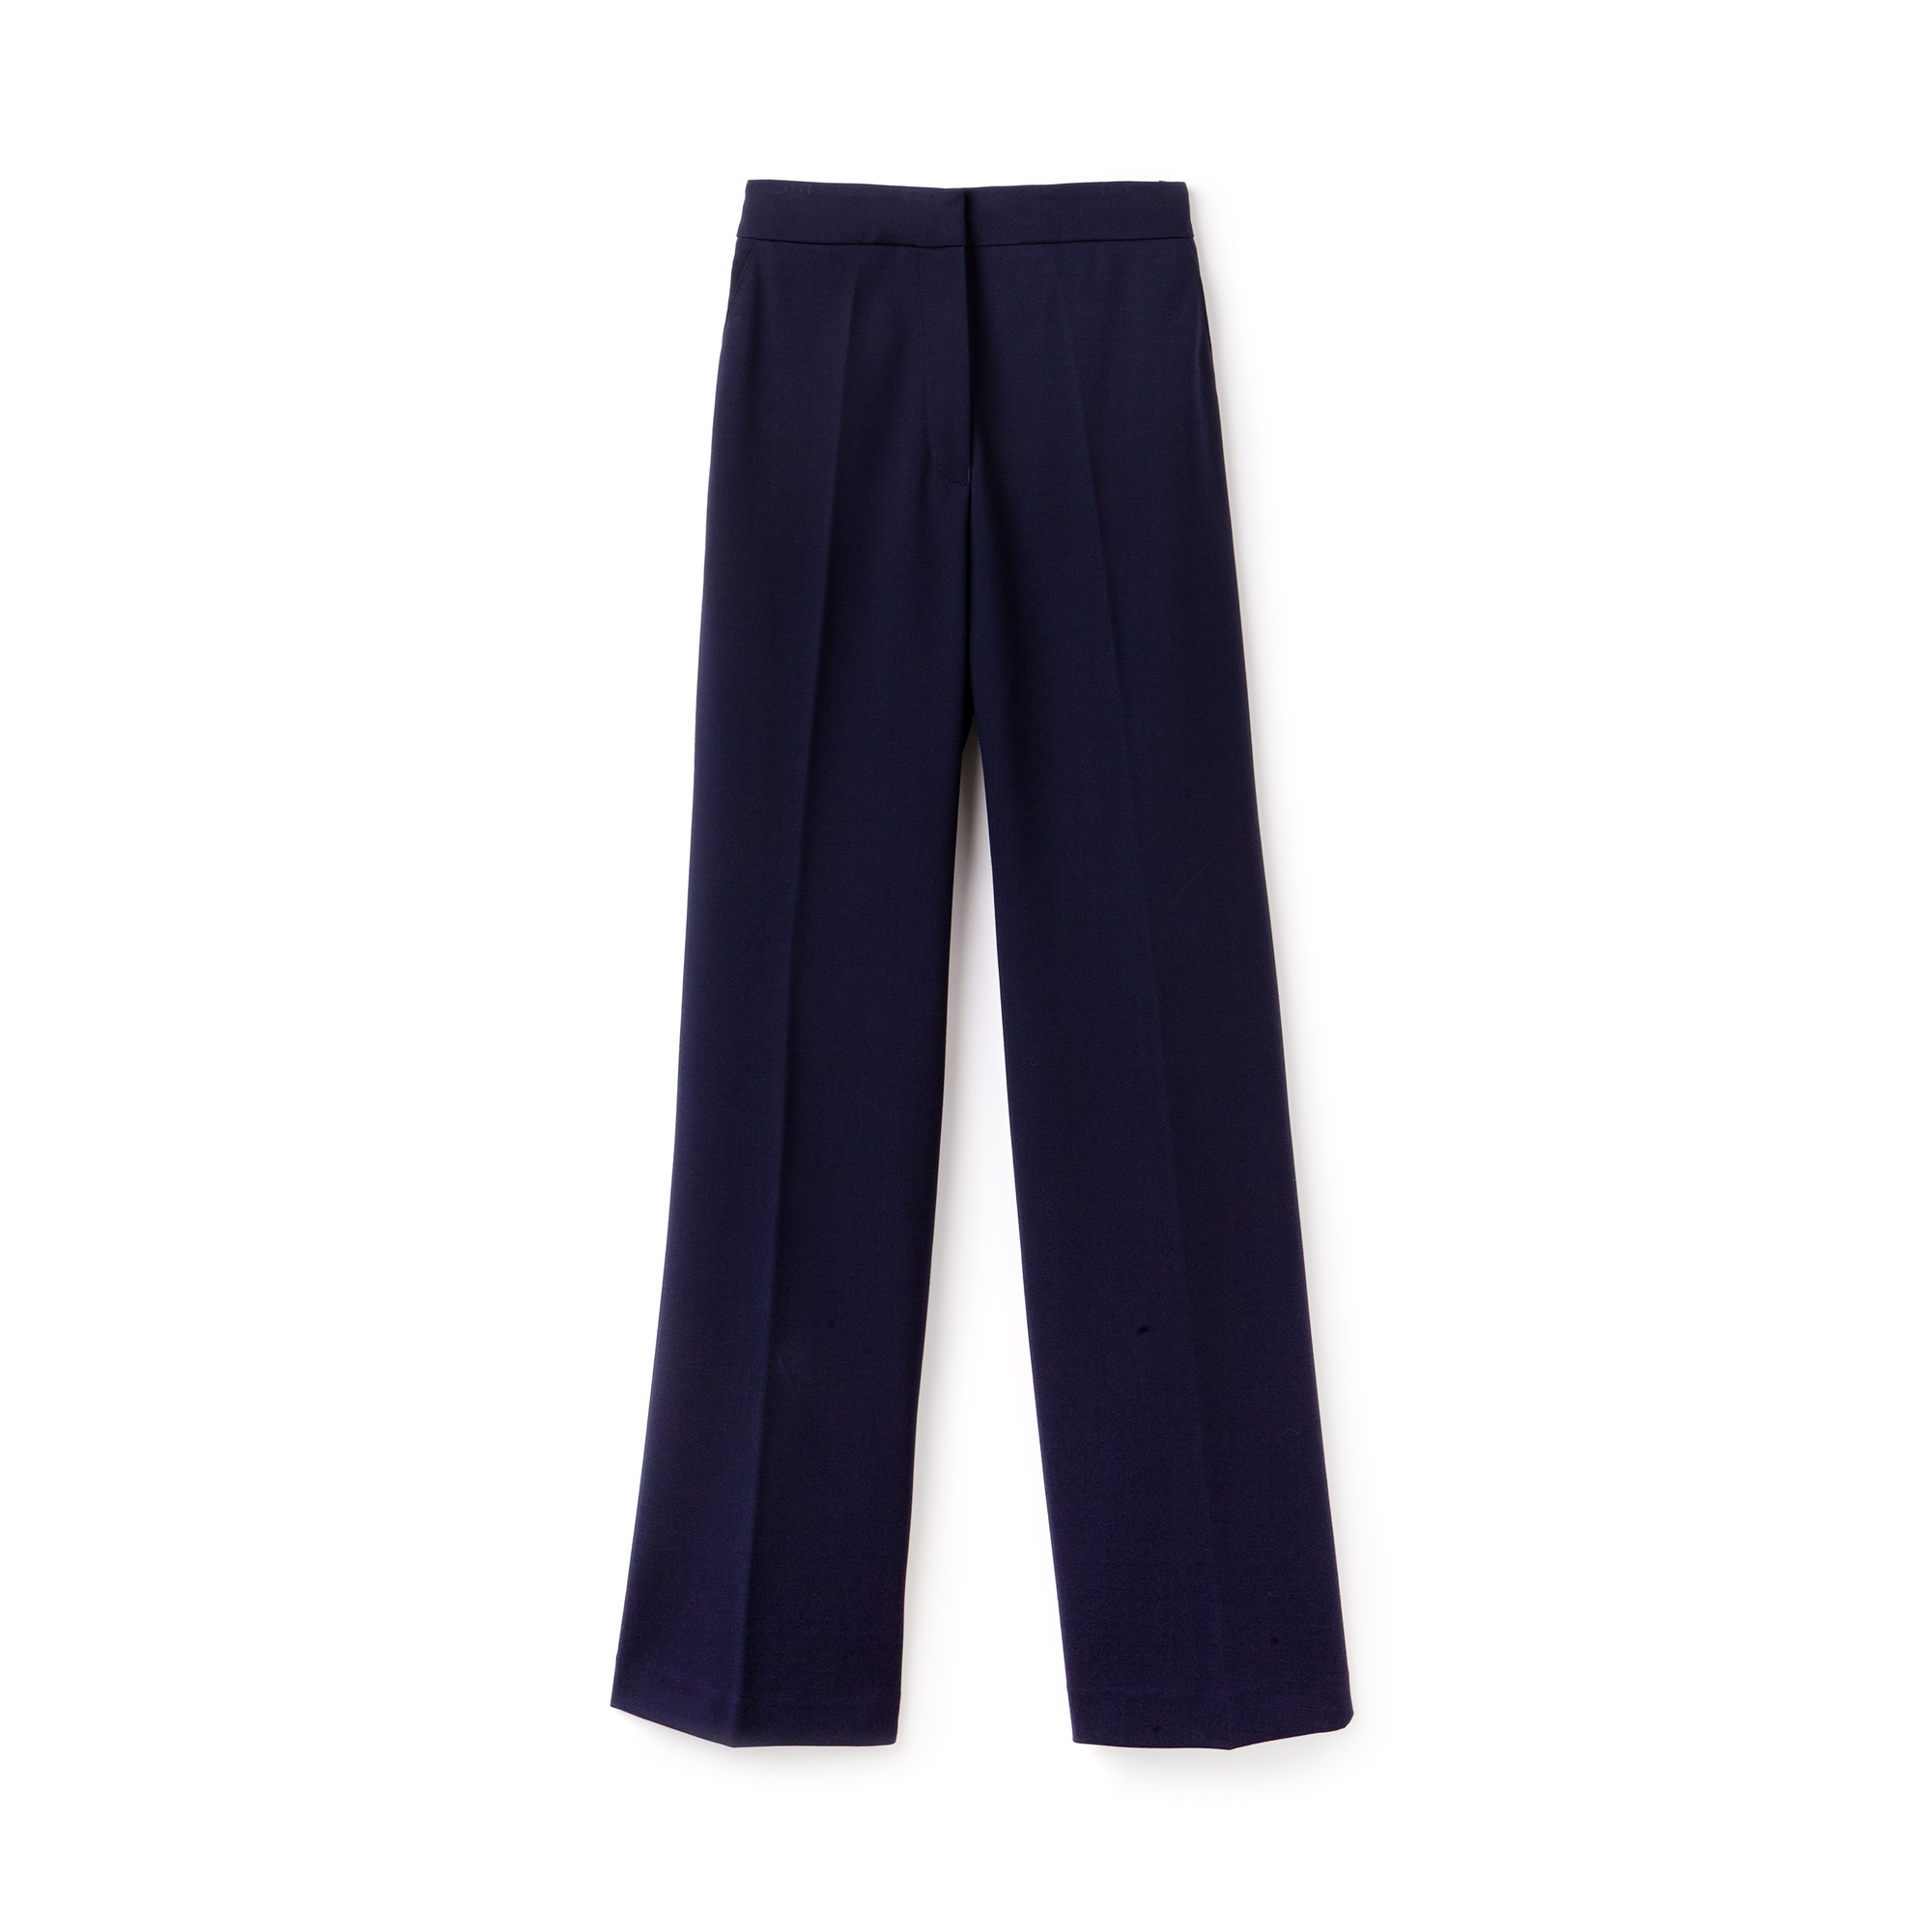 Women's Flowing Stretch Milano Knit Pants